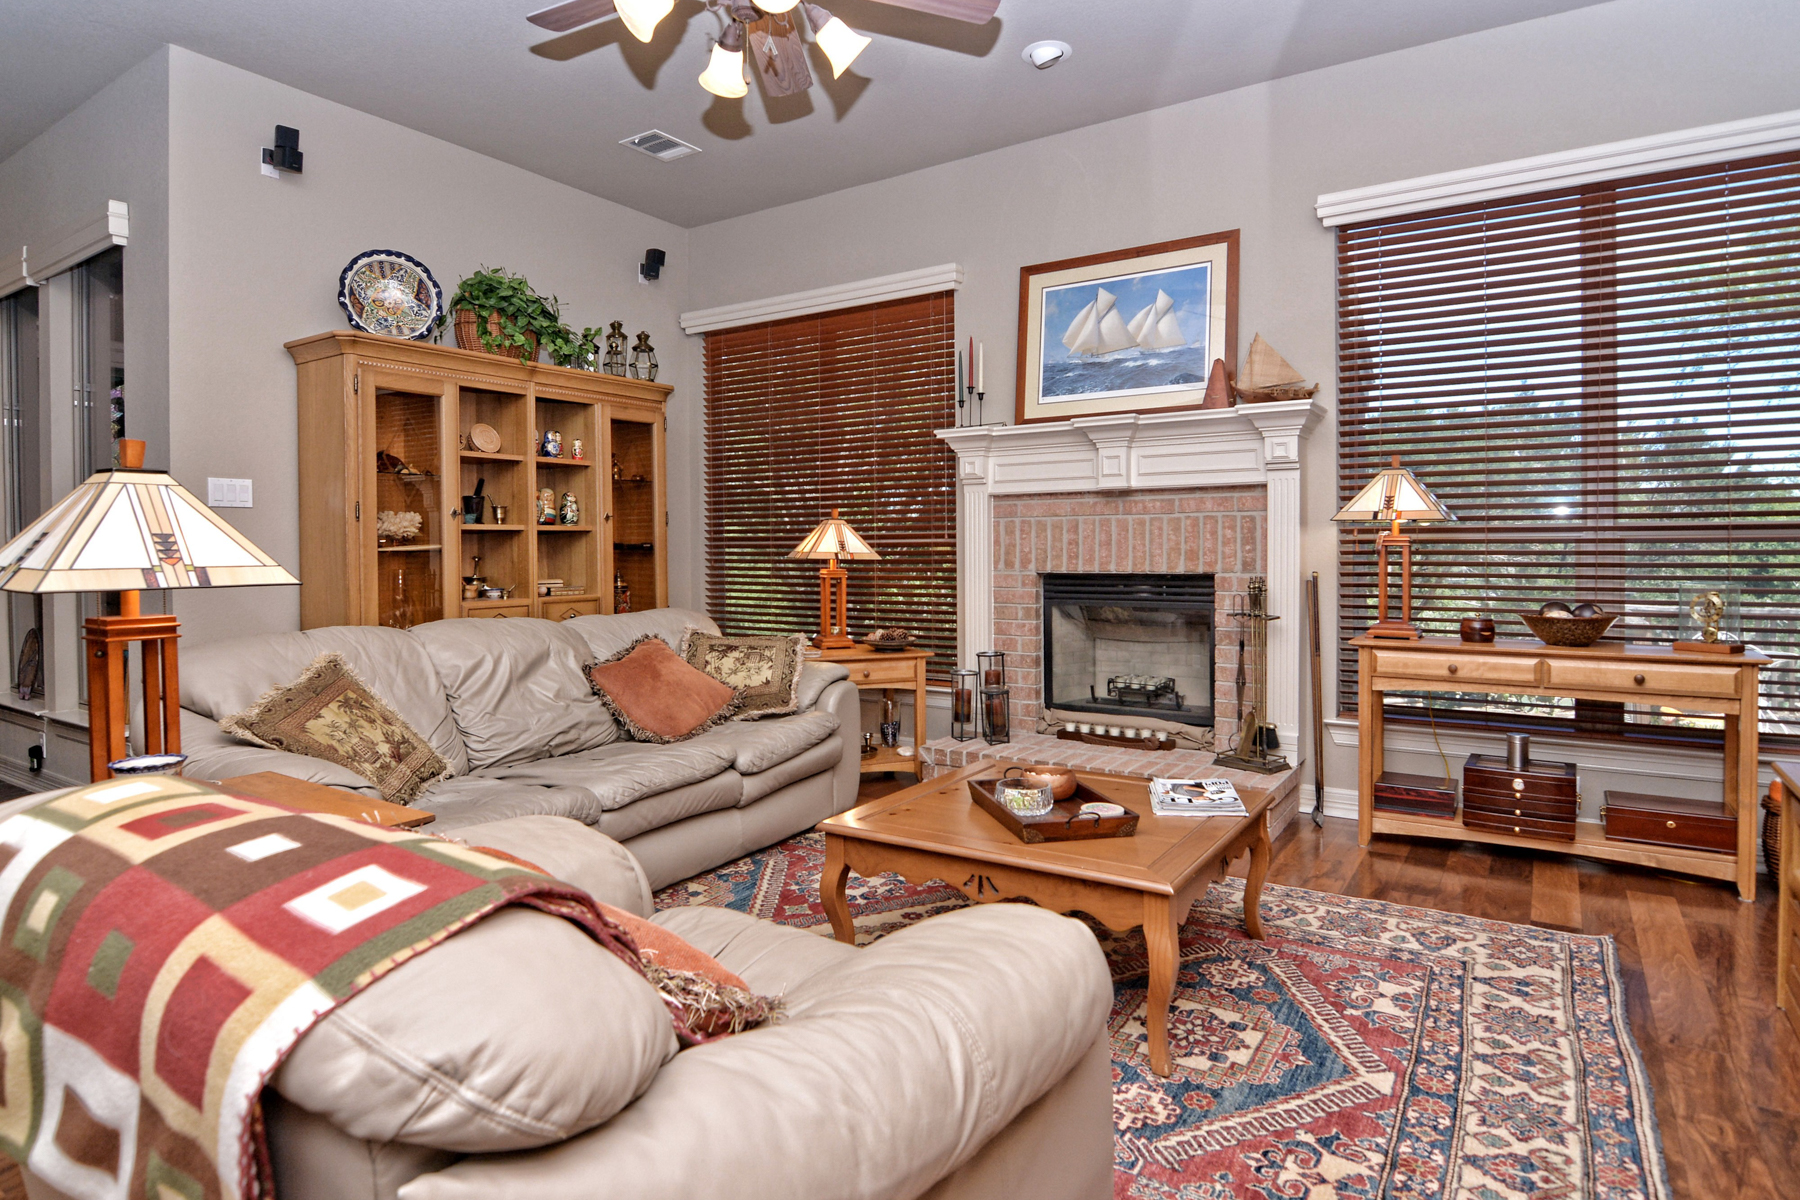 Additional photo for property listing at Gorgeous Home in Cavalo Creek Estates 21502 Roan Chase San Antonio, Texas 78259 Estados Unidos